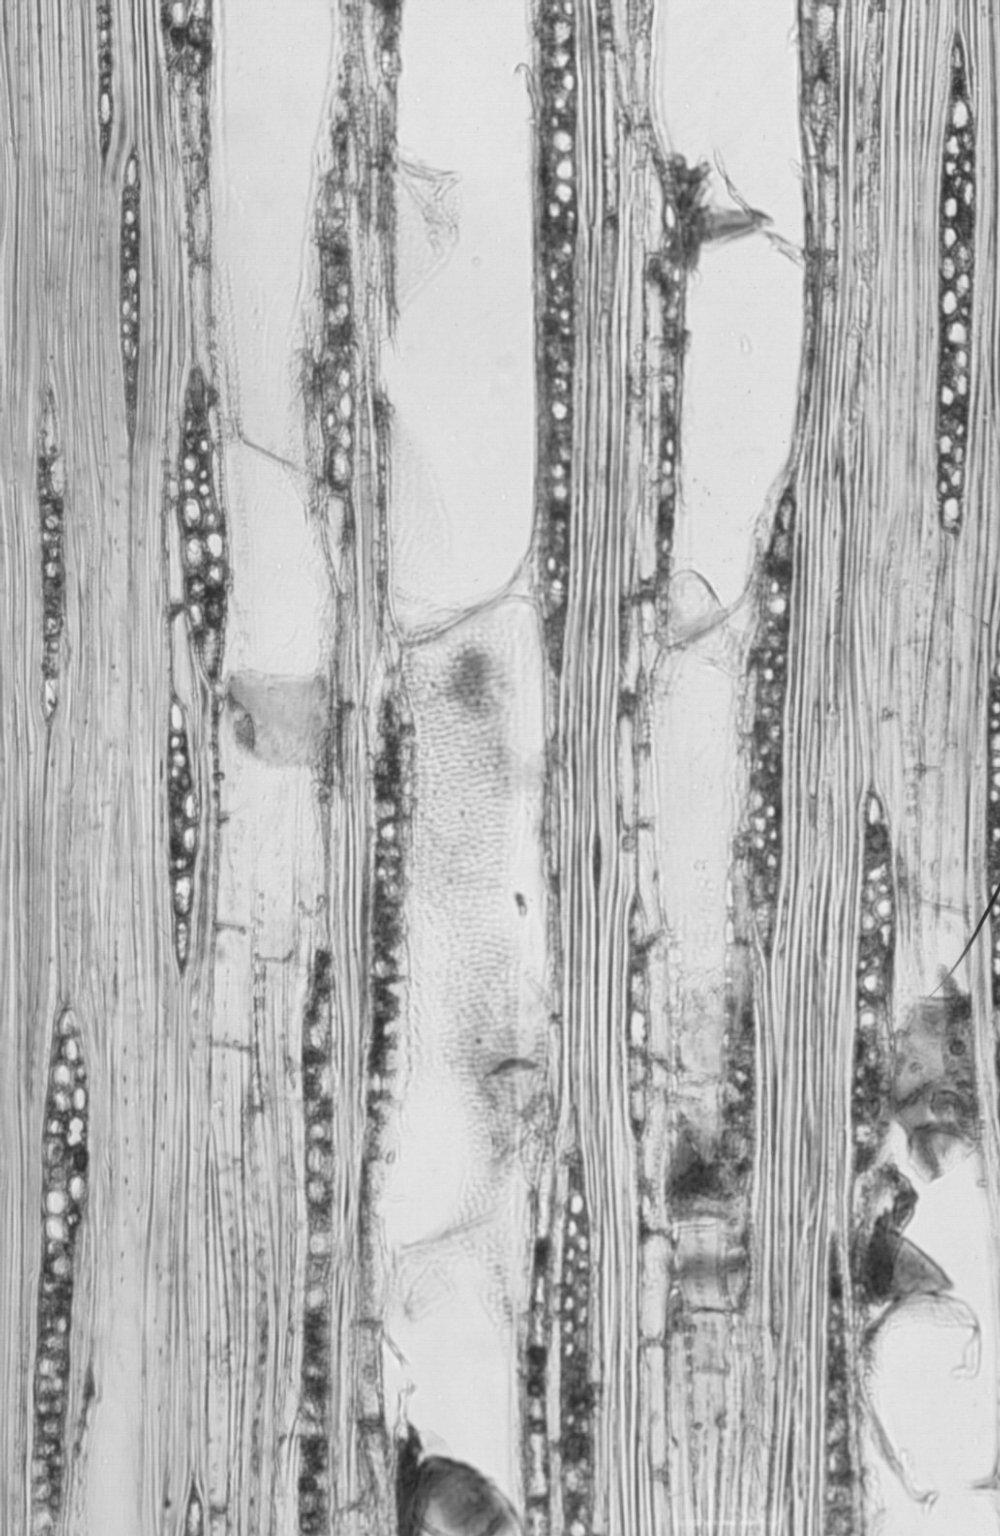 ERYTHROXYLACEAE Erythroxylum ecarinatum